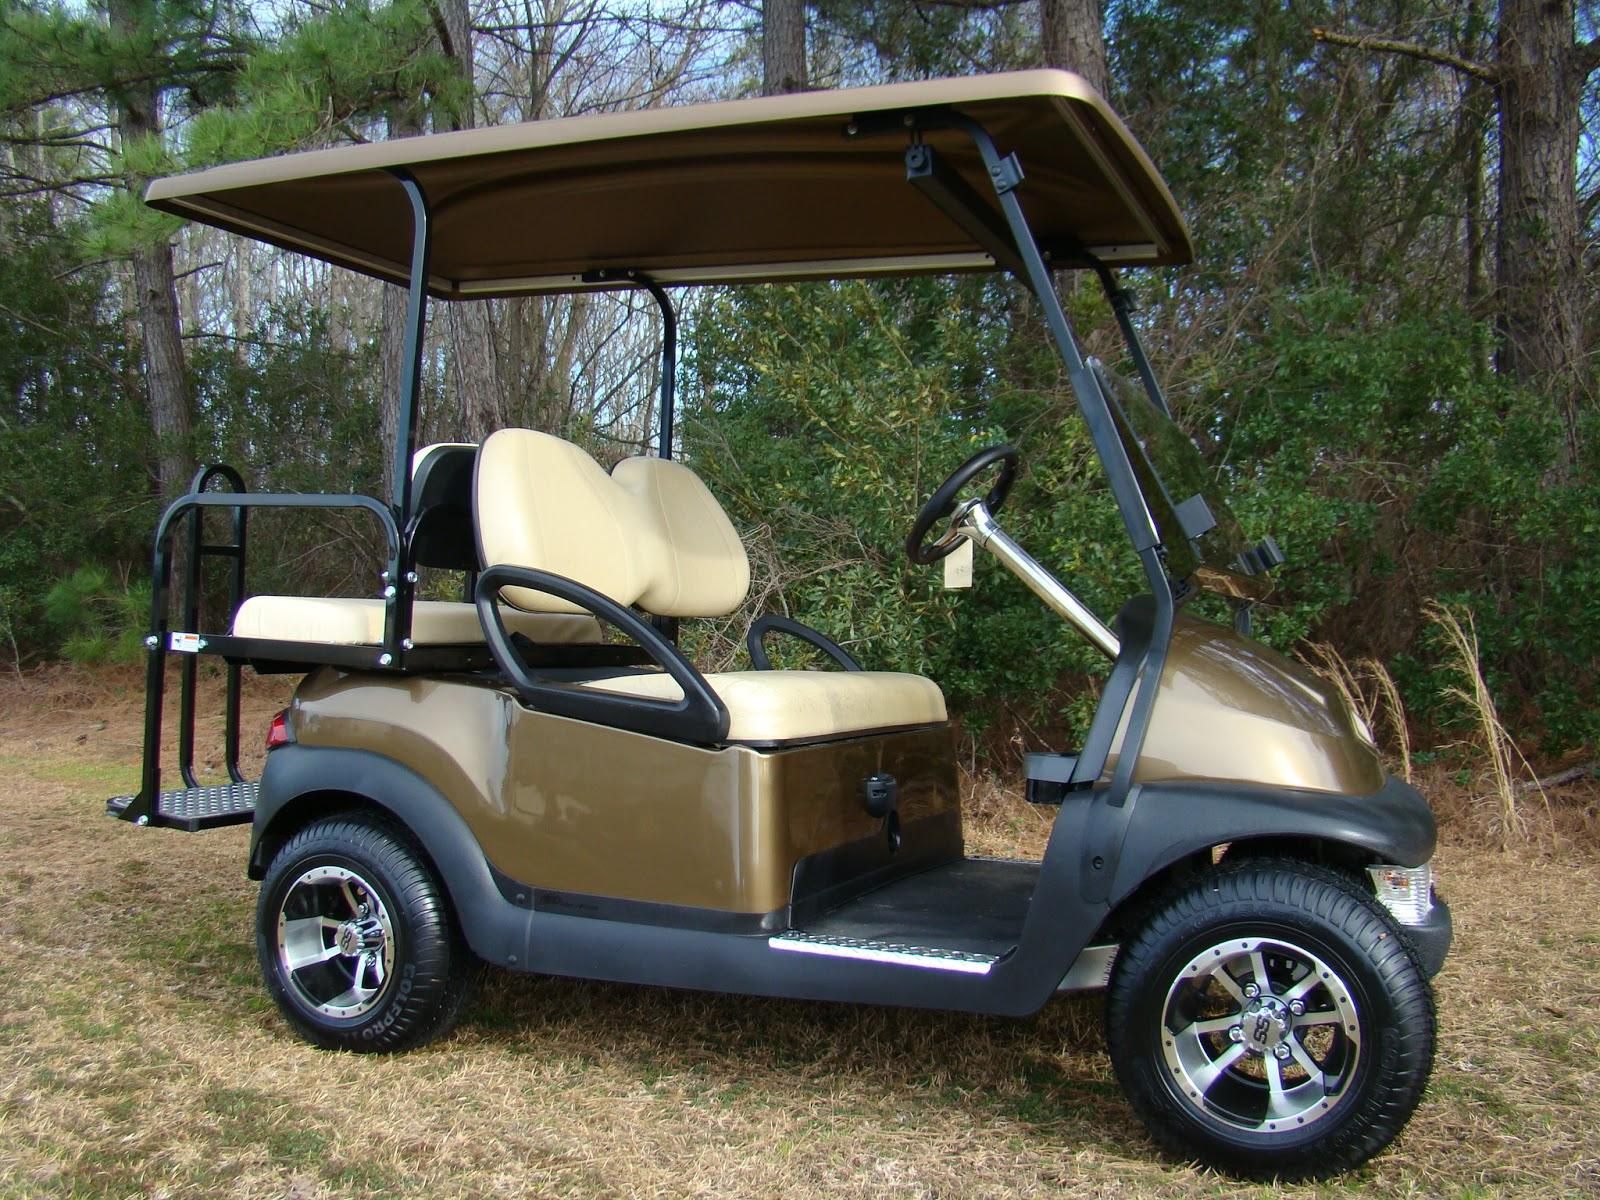 King Of Carts New Used Electric Gas Golf Carts For Sale In Sc Nc Ga Fl Va Wv Al Md De